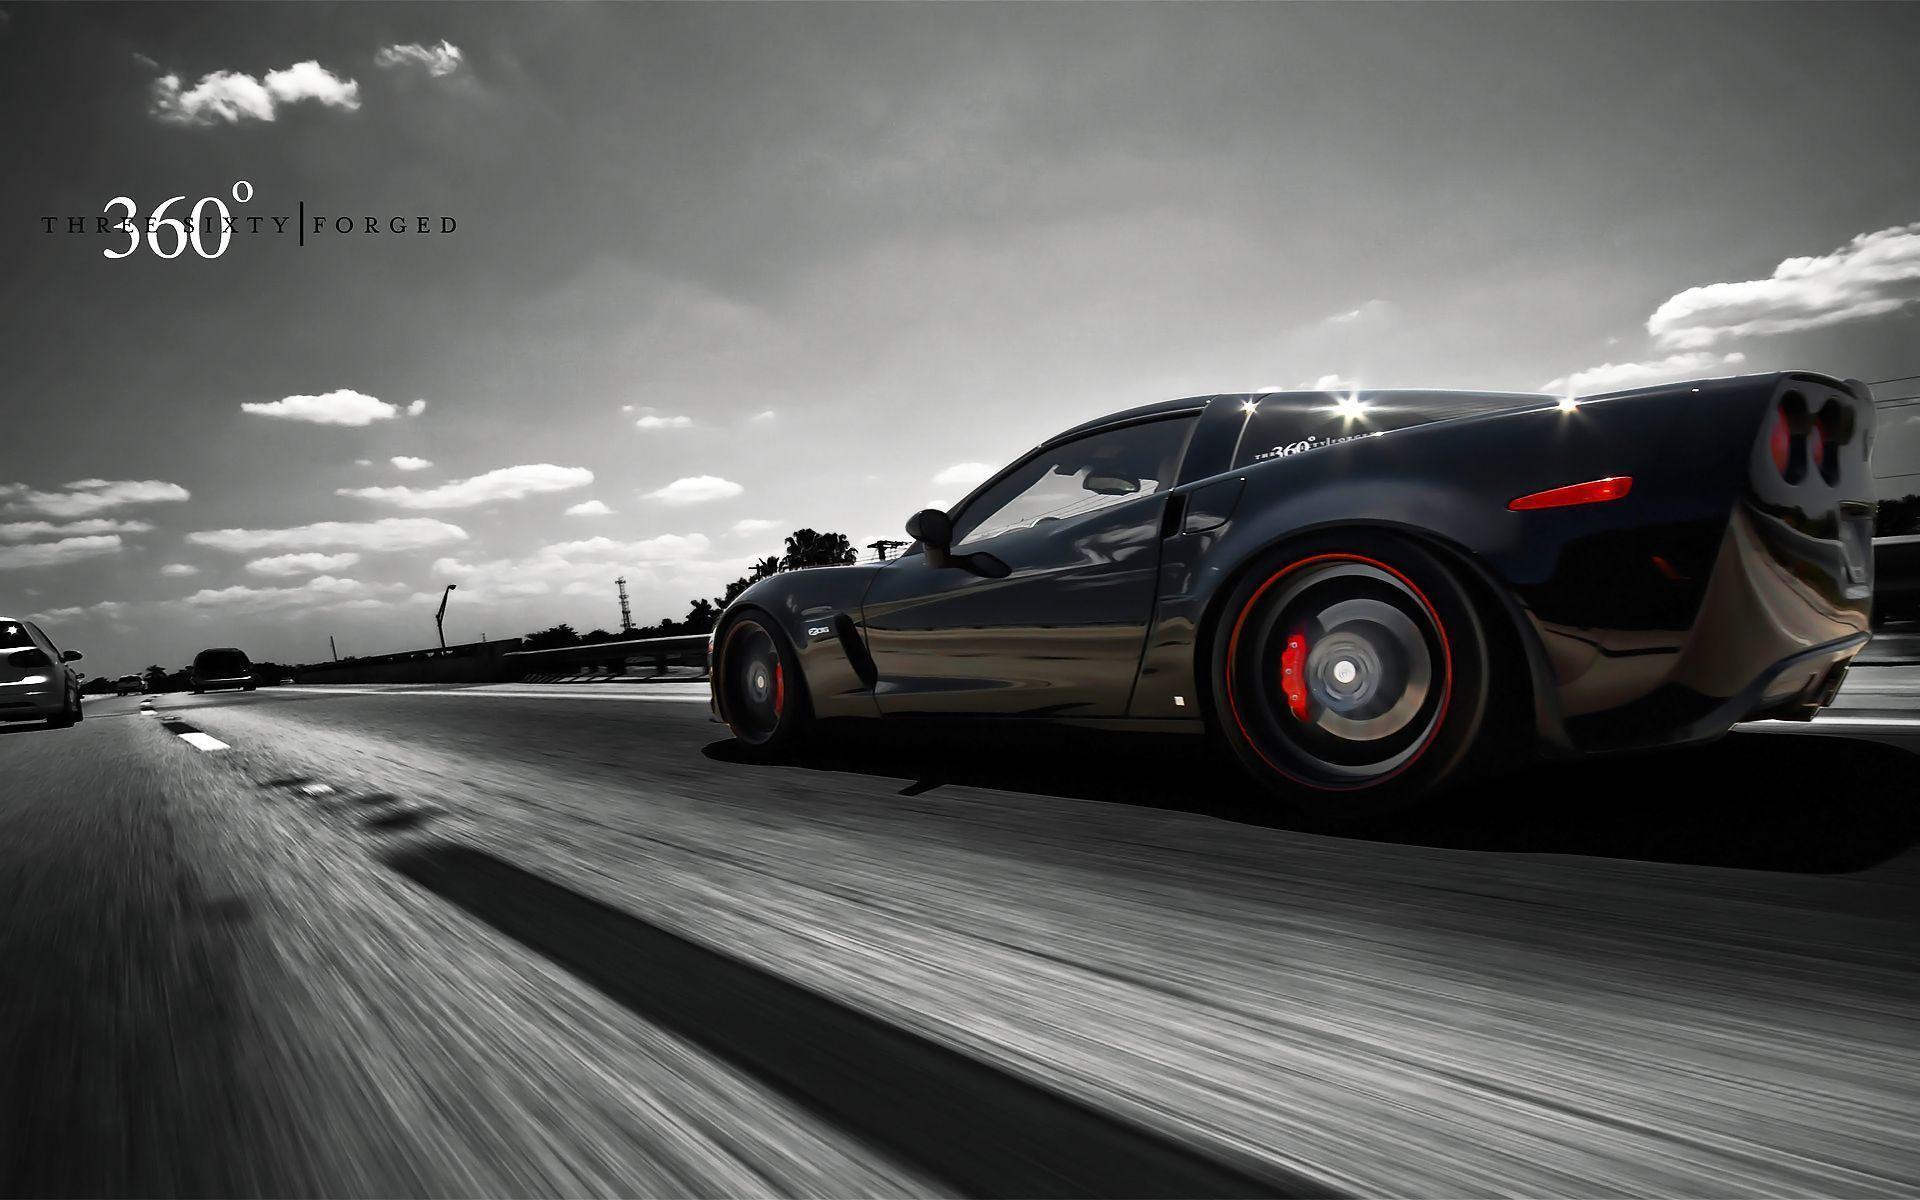 Corvette 2017 Wallpapers HD Wallpaper Cave